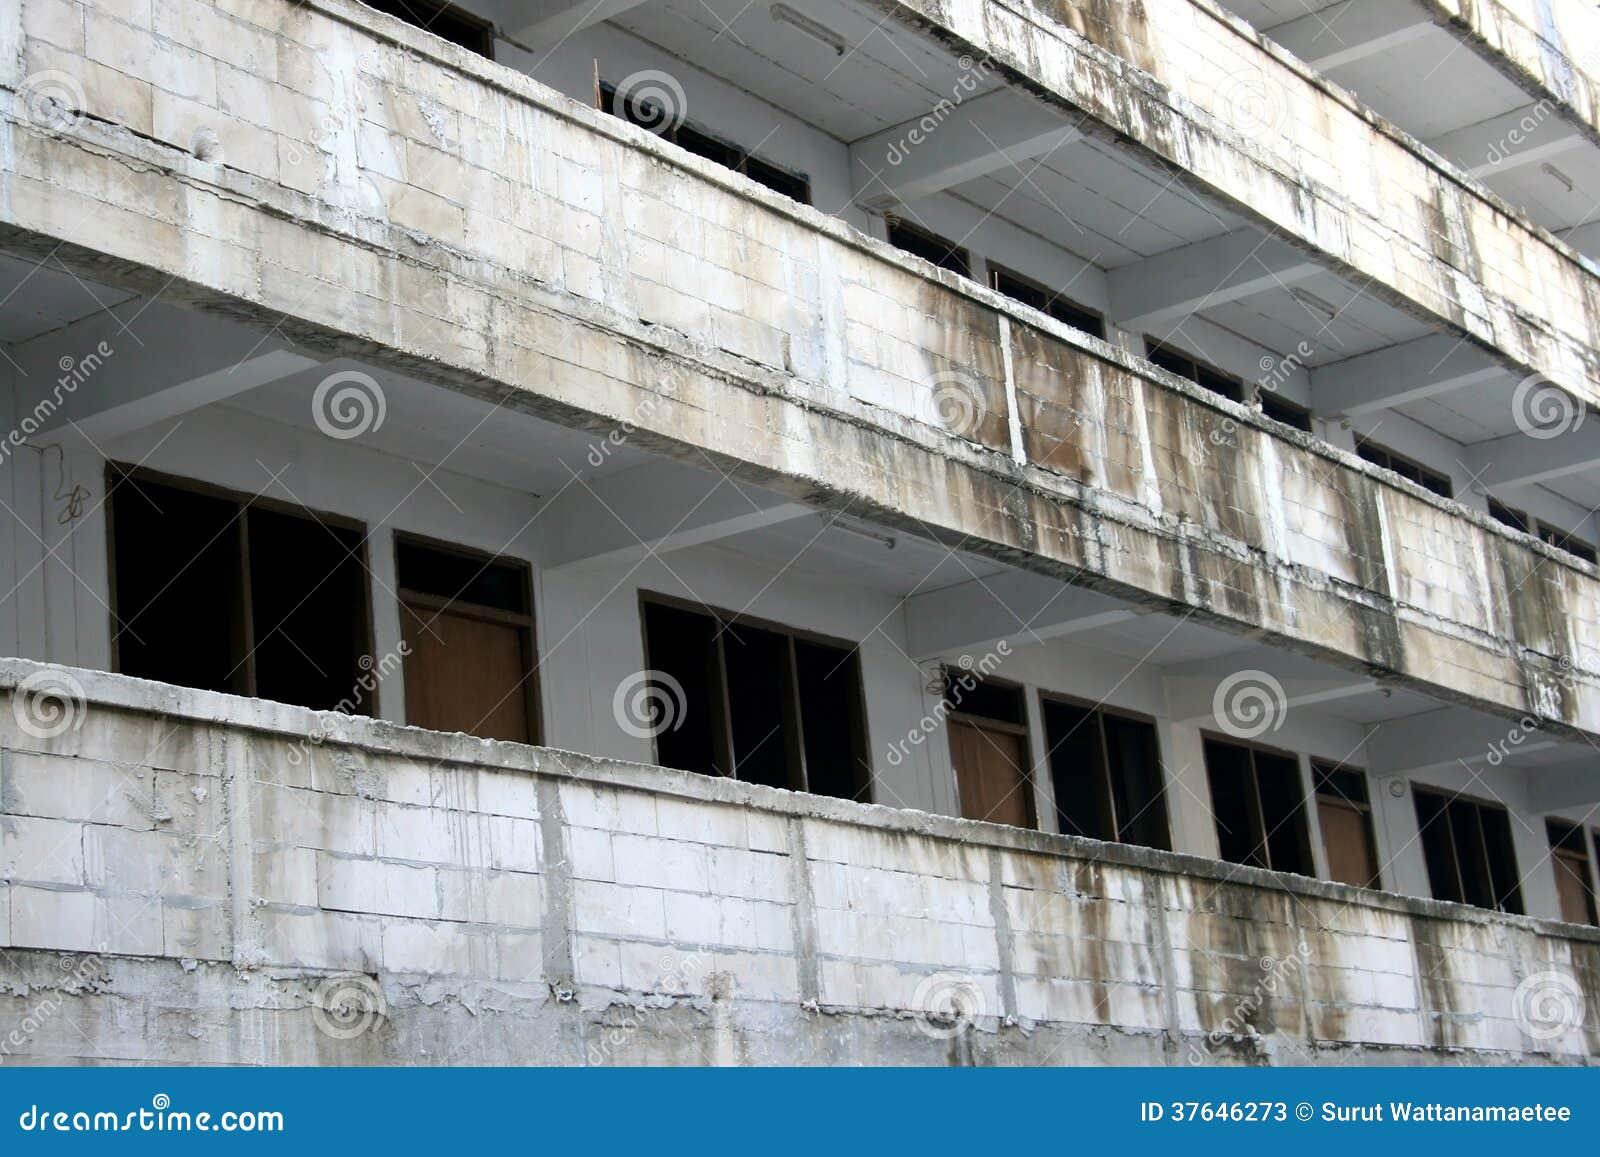 Old Concrete Buildings : Old dirty concrete building stock photos image